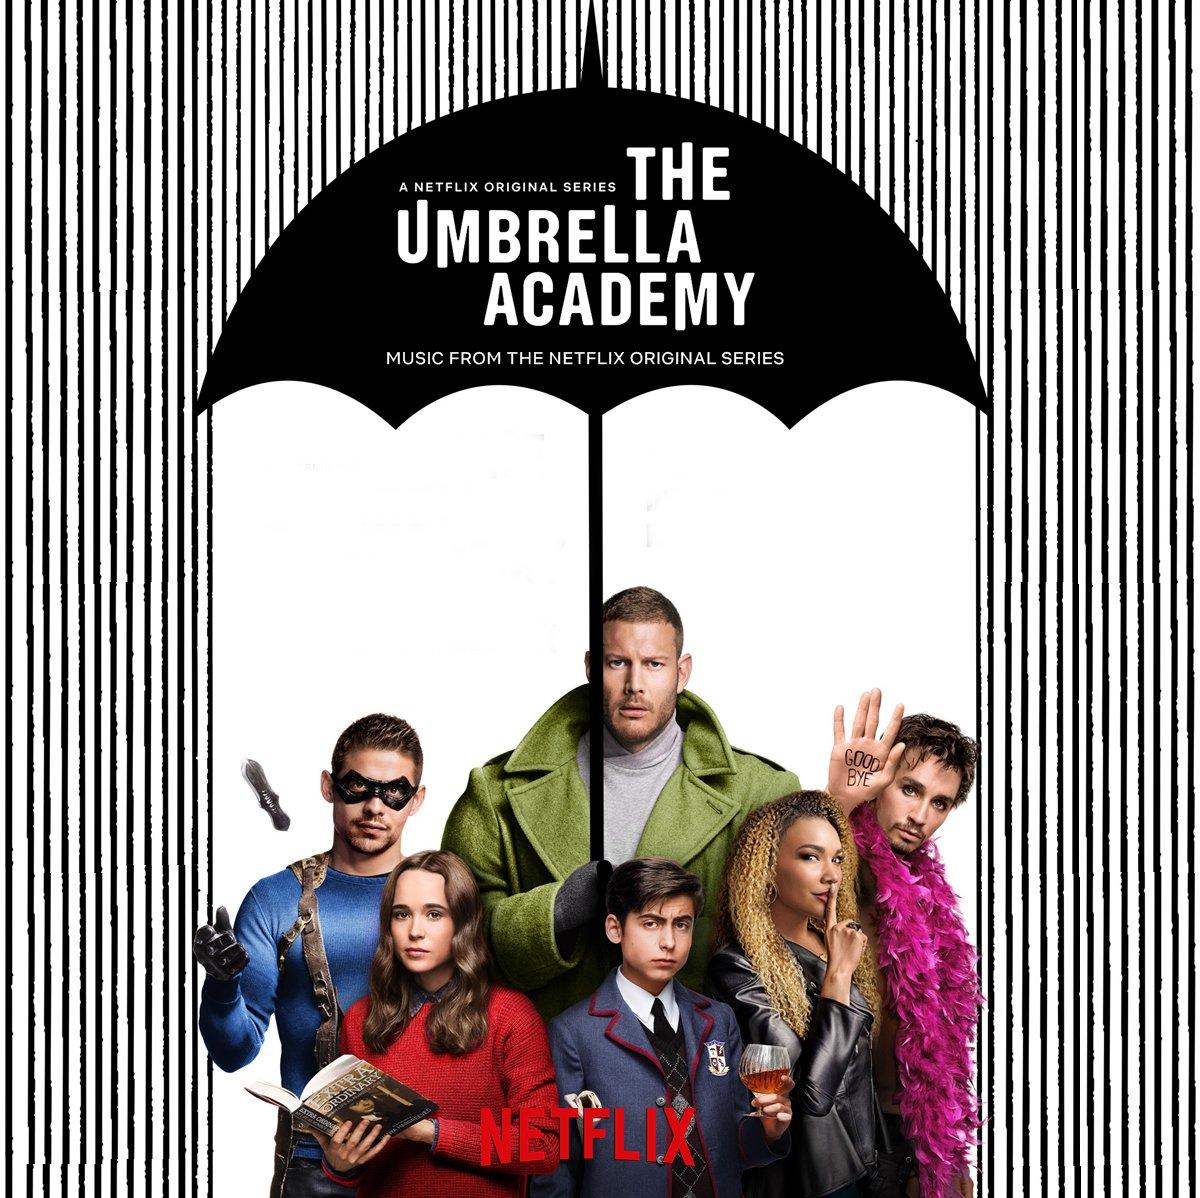 [COMPLETE LIST - ALL SONGS: SEASON 01]  The Umbrella Academy: Season 01 (Music from the Netflix Original Series) |  Playlist #TheUmbrellaAcademy     https:// open.spotify.com/playlist/106EU 2VSydl7lyUIysu6BU &nbsp; … <br>http://pic.twitter.com/luf3PhngMk